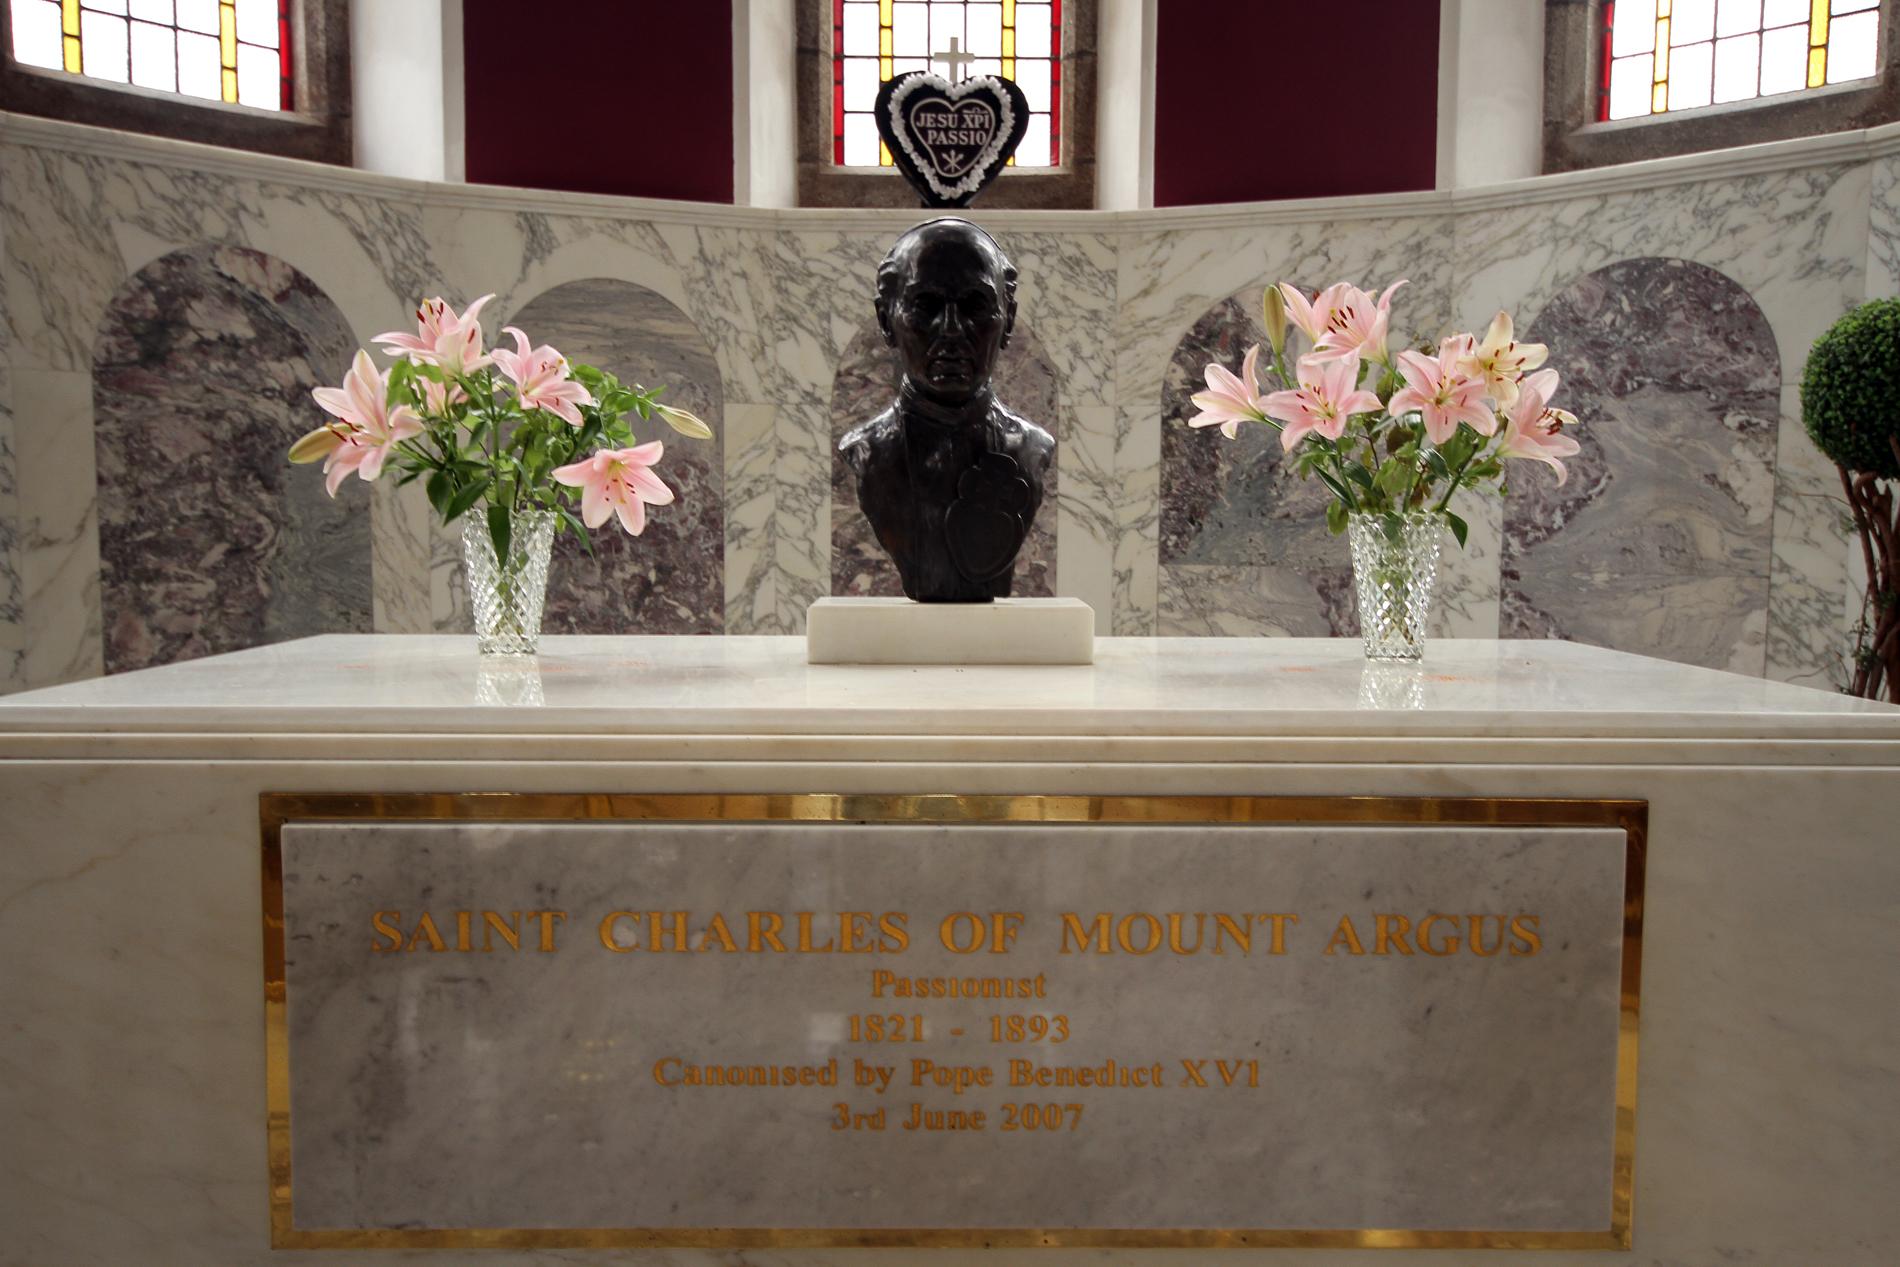 Saint-Charles-of-Mount-Argus-1821-1893-6286